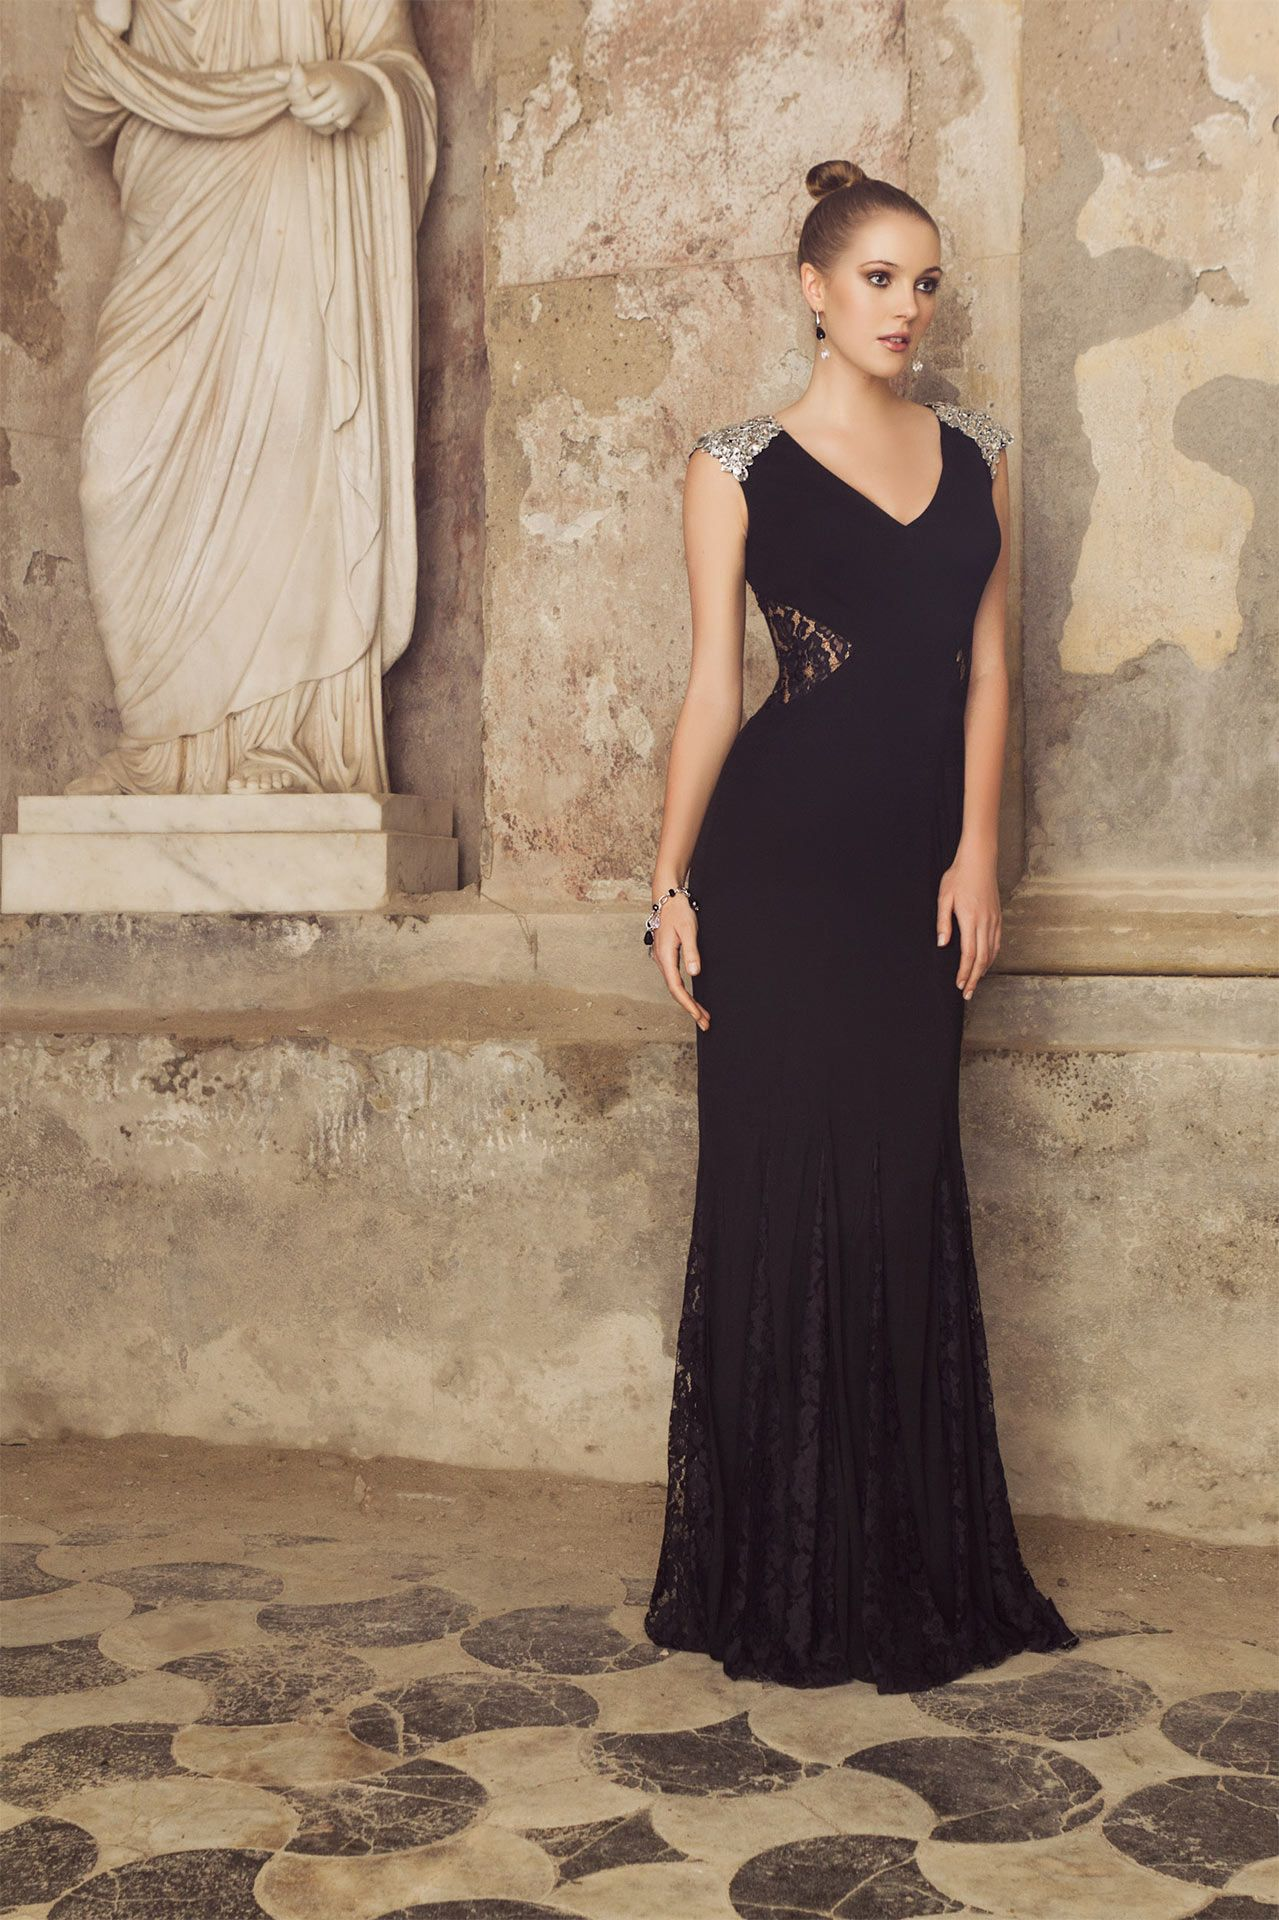 #imperocouture #abiti #dress #cerimonia #abito #sera #ceremony #cocktaildress #partydress #damigella #redcarpetdress #bridesmaid #bridesmaiddres #black #nero